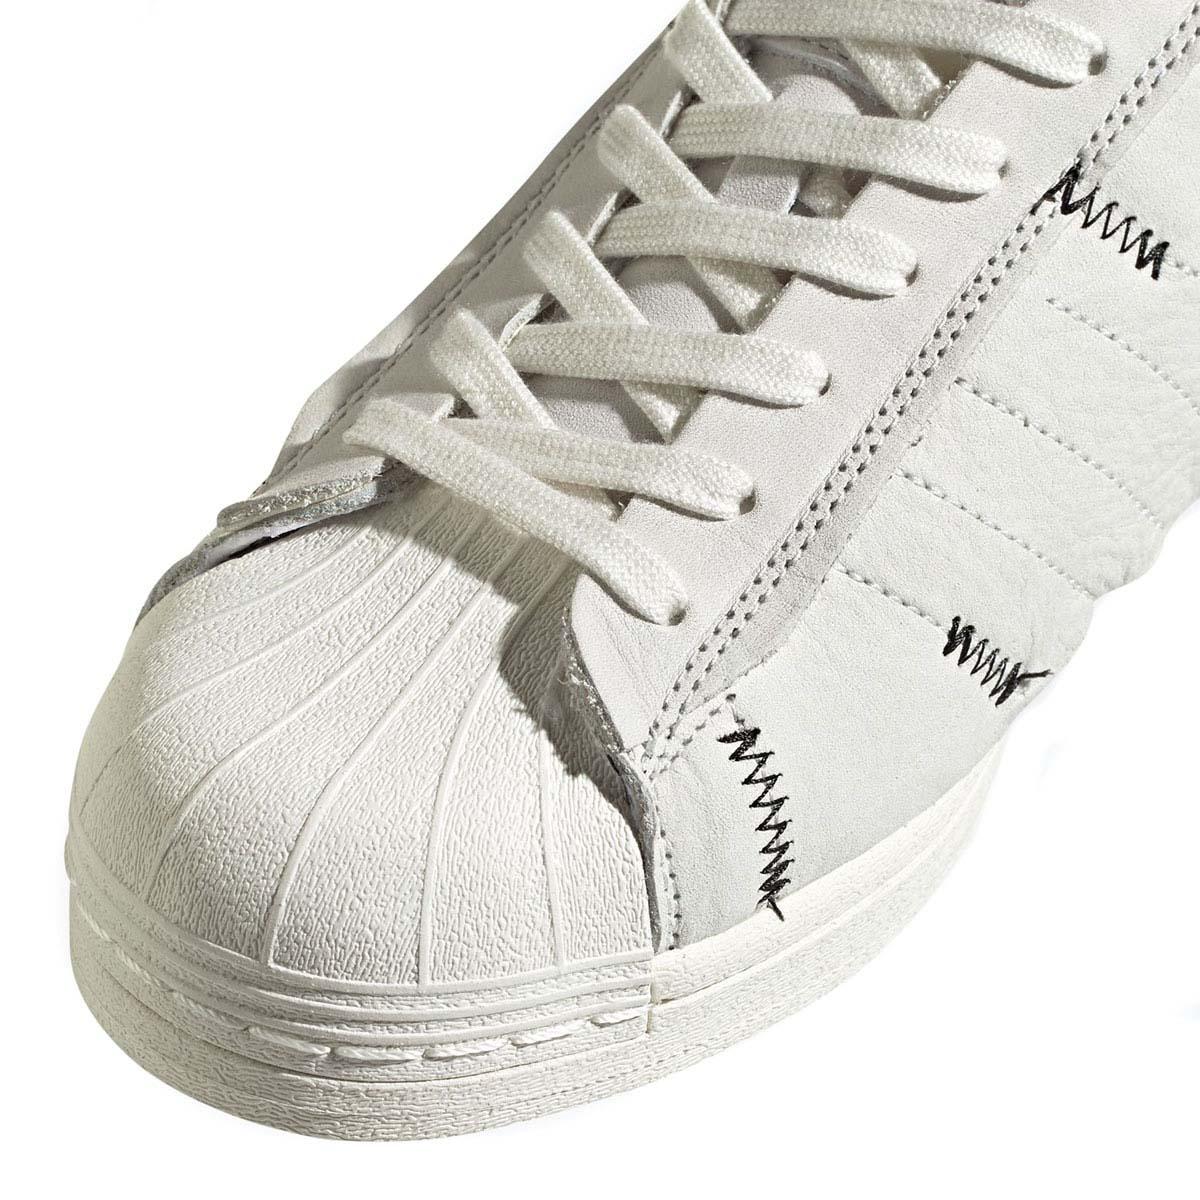 adidas SUPERSTAR FOOTWEAR WHITE / CORE BLACK / OFF WHITE FV3023 アディダス スーパースター グレー/ブラック/ホワイト